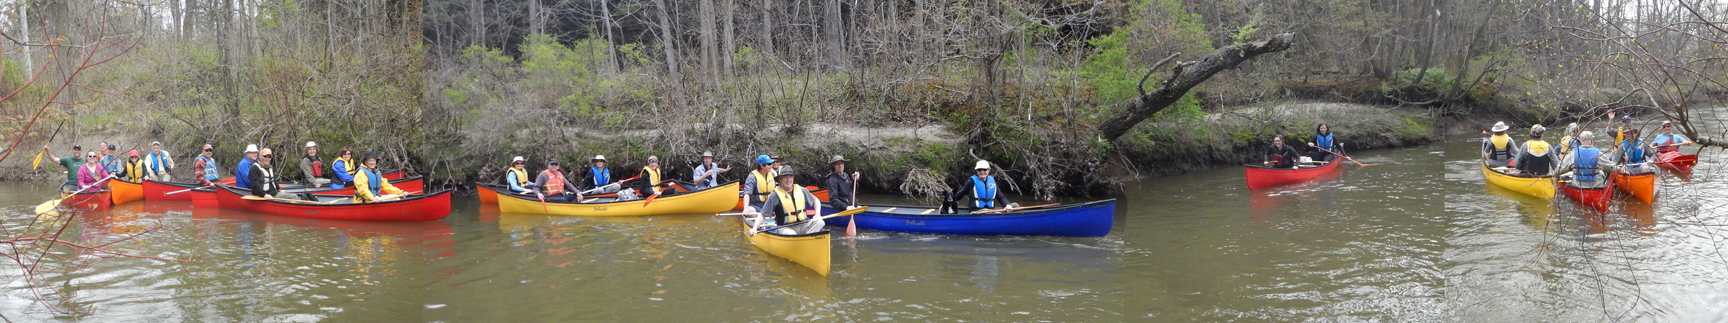 Quetico_Foundation_Canoe_Day_2016_group_photo_courtesy_Darren_Harding_and_Noah_Cole_v5